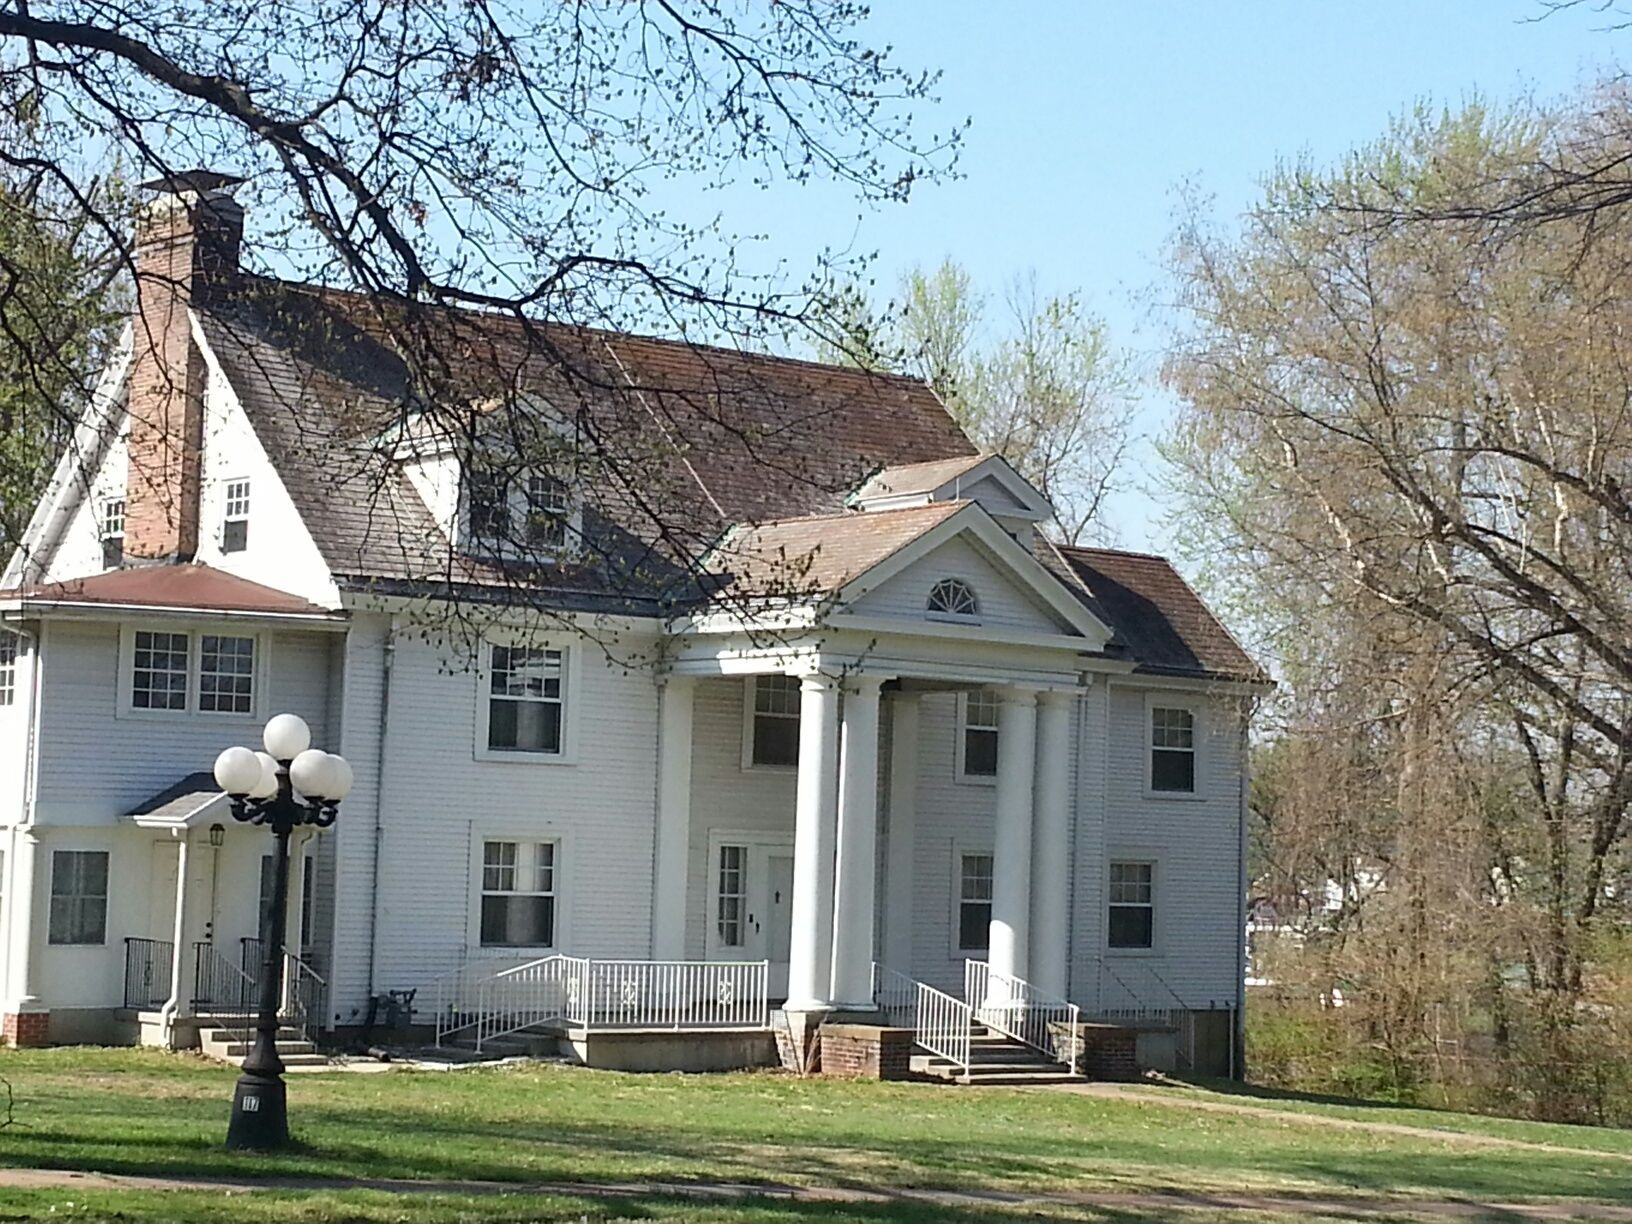 Old Town Ferguson historic home. | Ferguson, Missouri | Pinterest